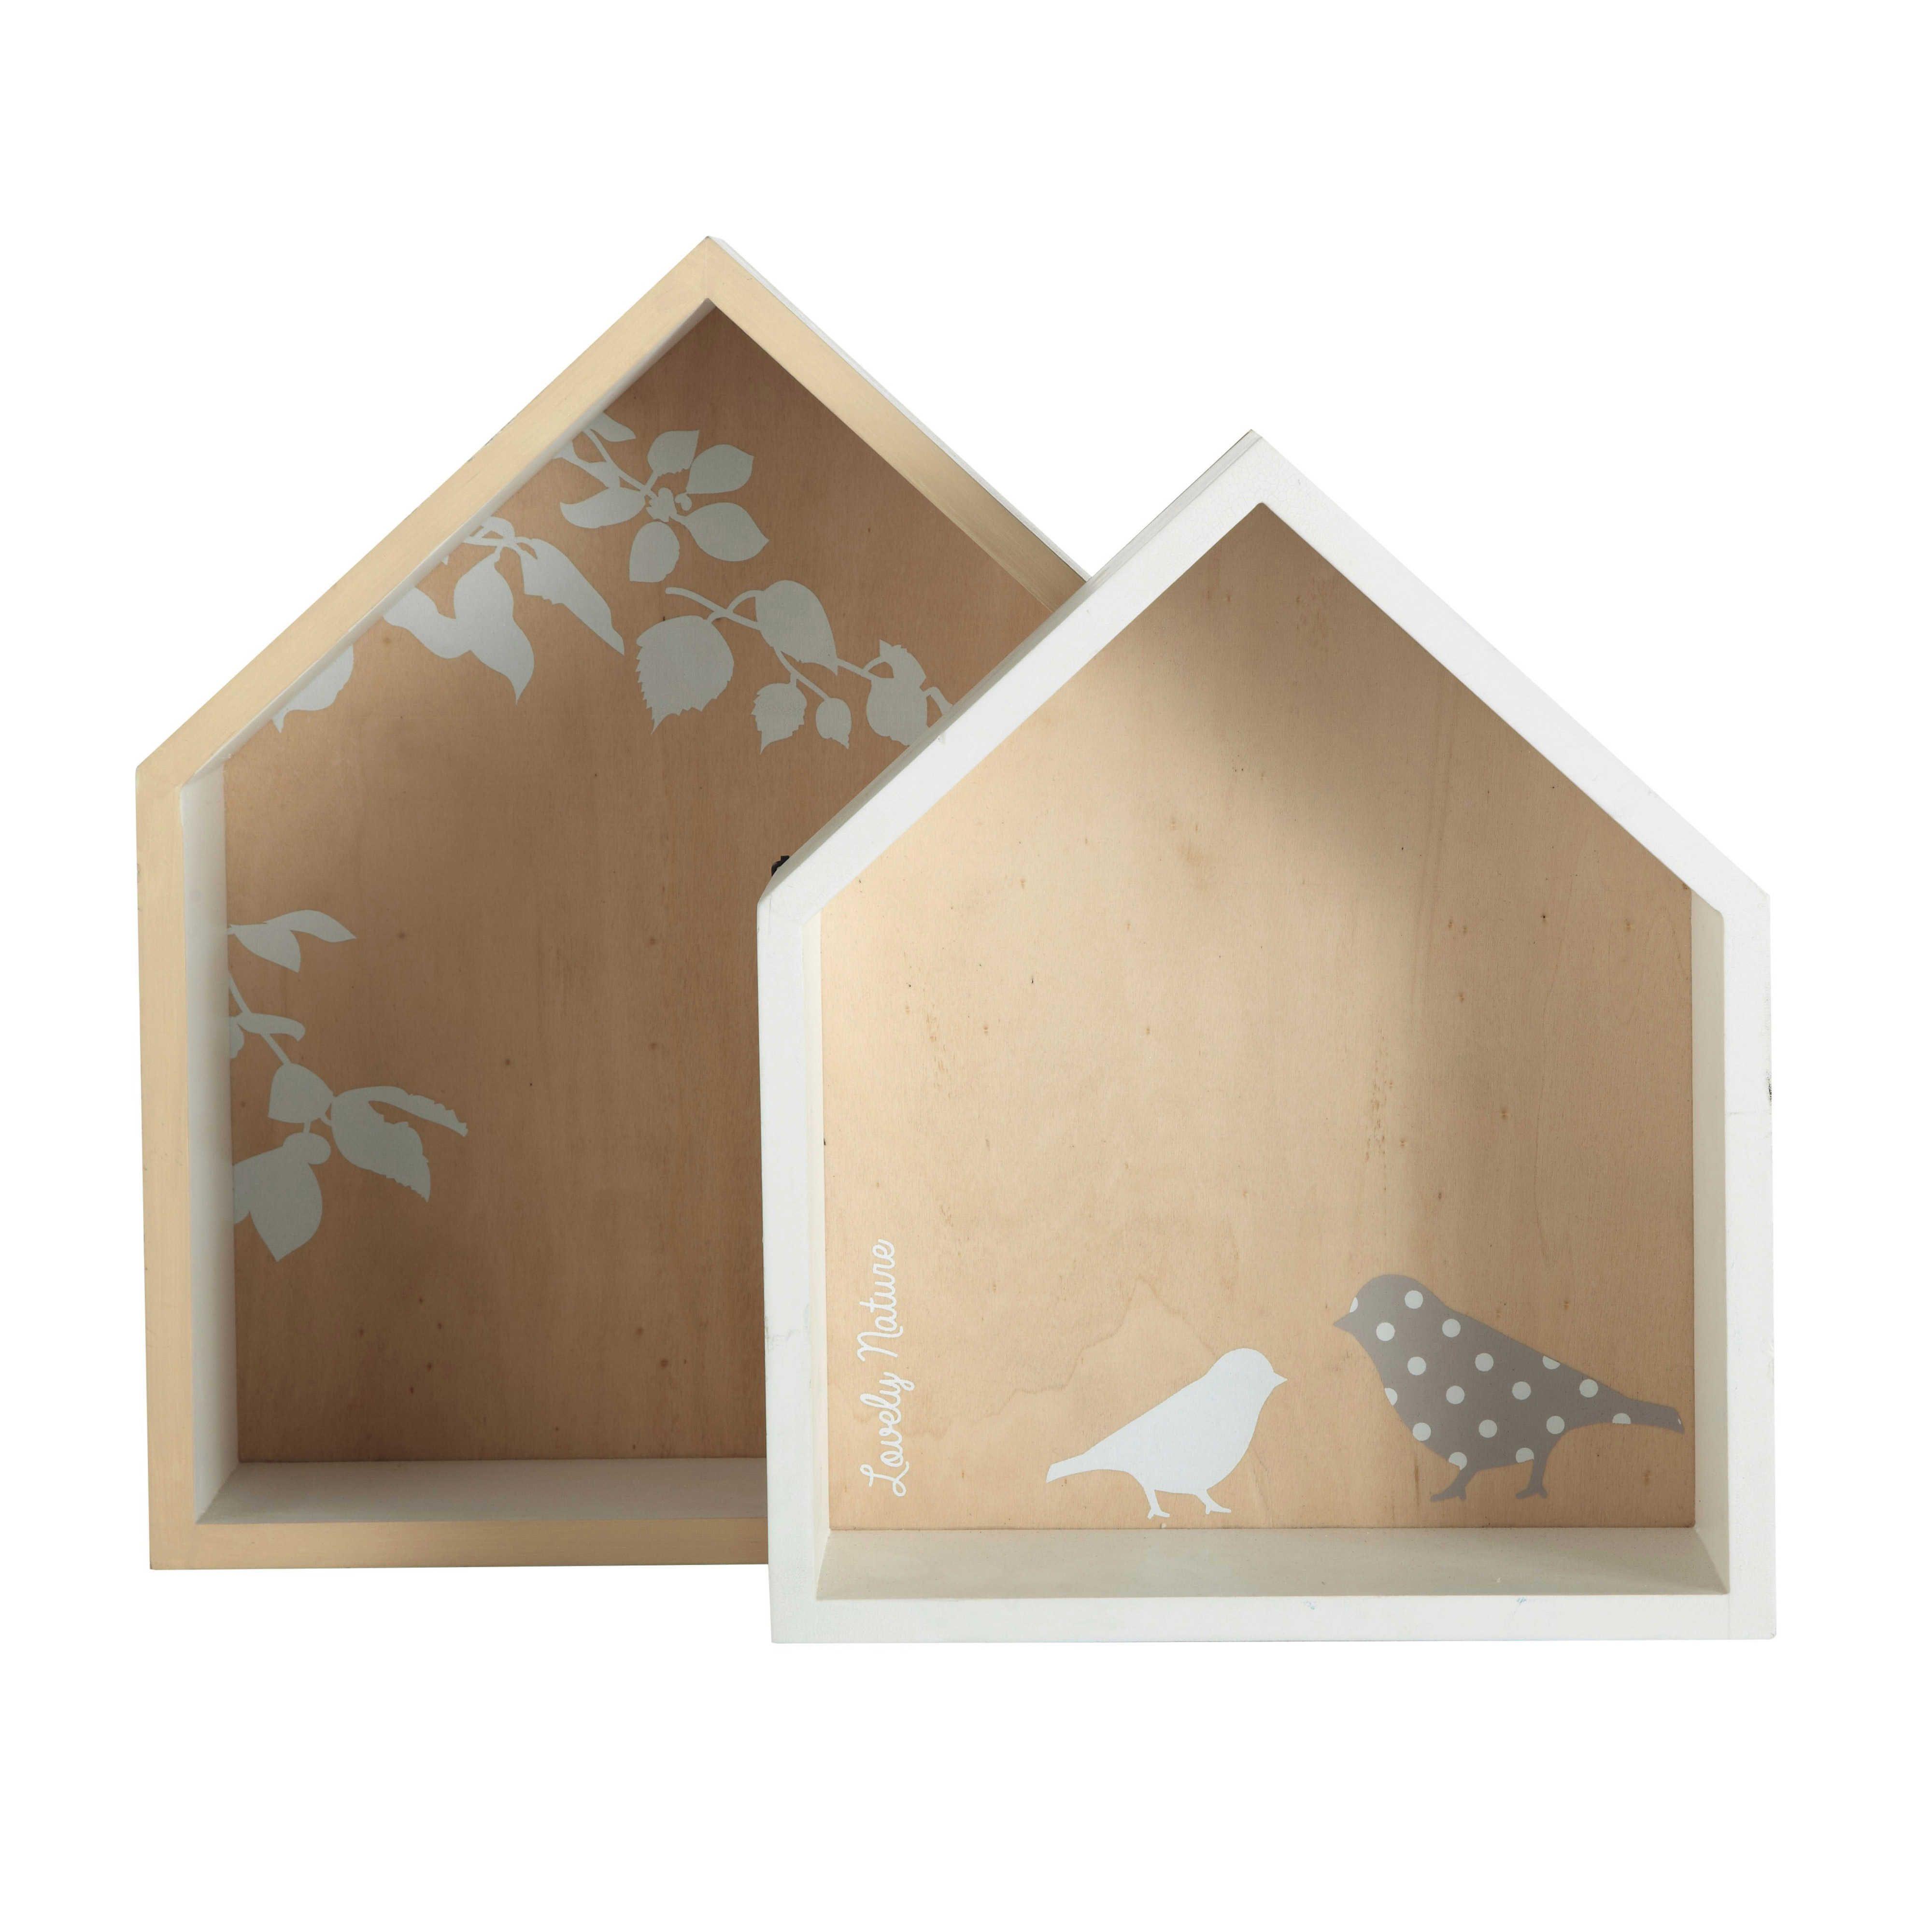 Mensole Maison Du Monde.2 Estanterias Casitas Blancas Al 30 Y 35 Cm Birds Houses